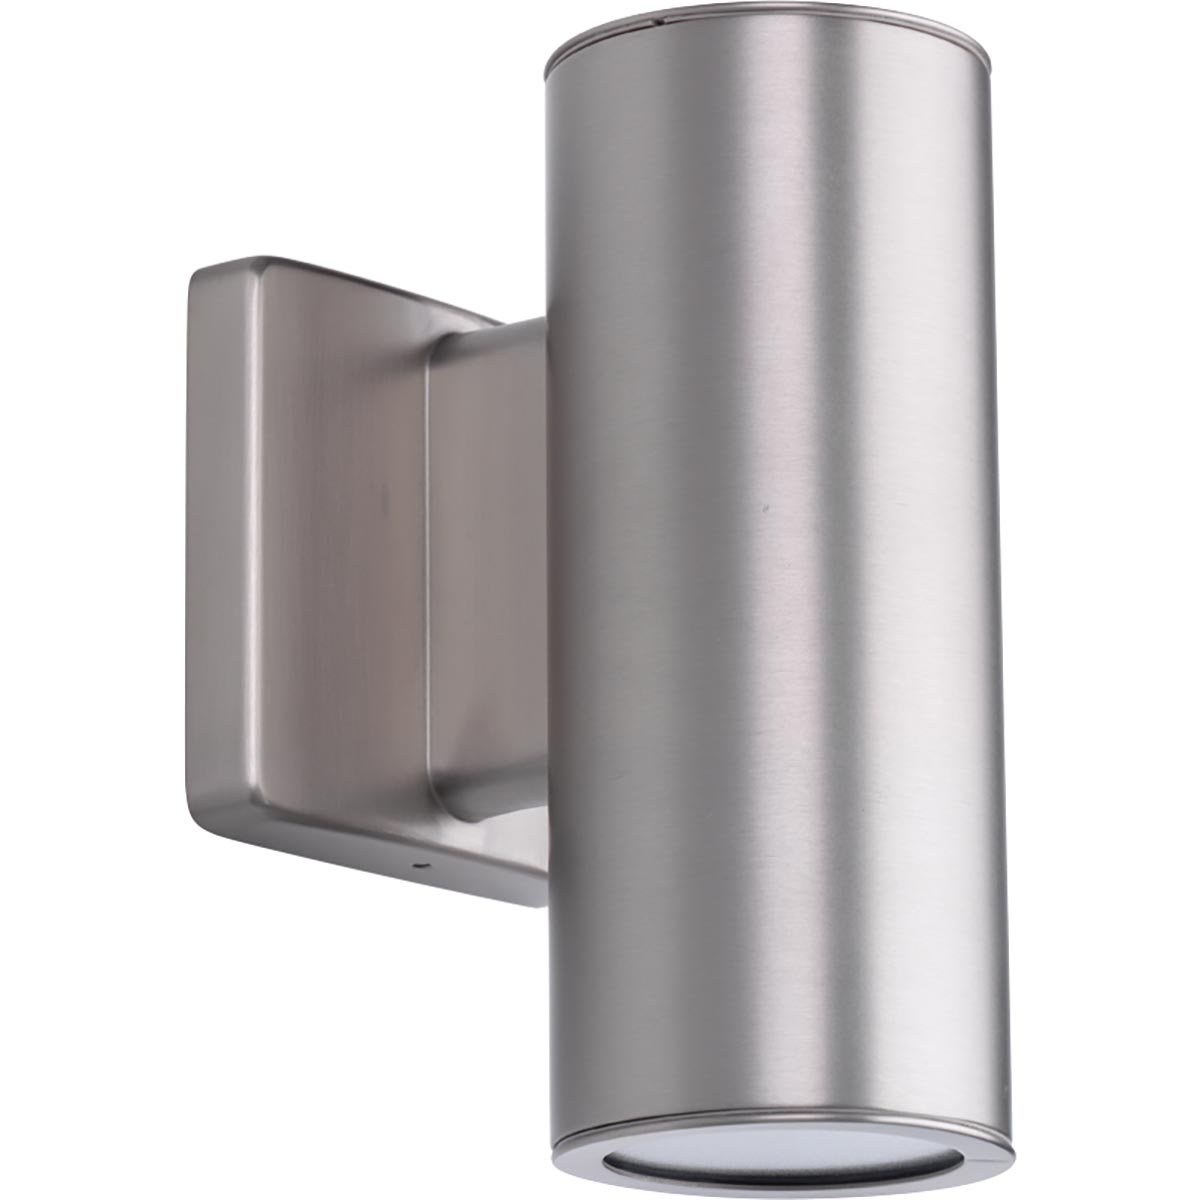 Progress Lighting P563001-147-30K 3IN Cylinders Wall Lantern, Grey